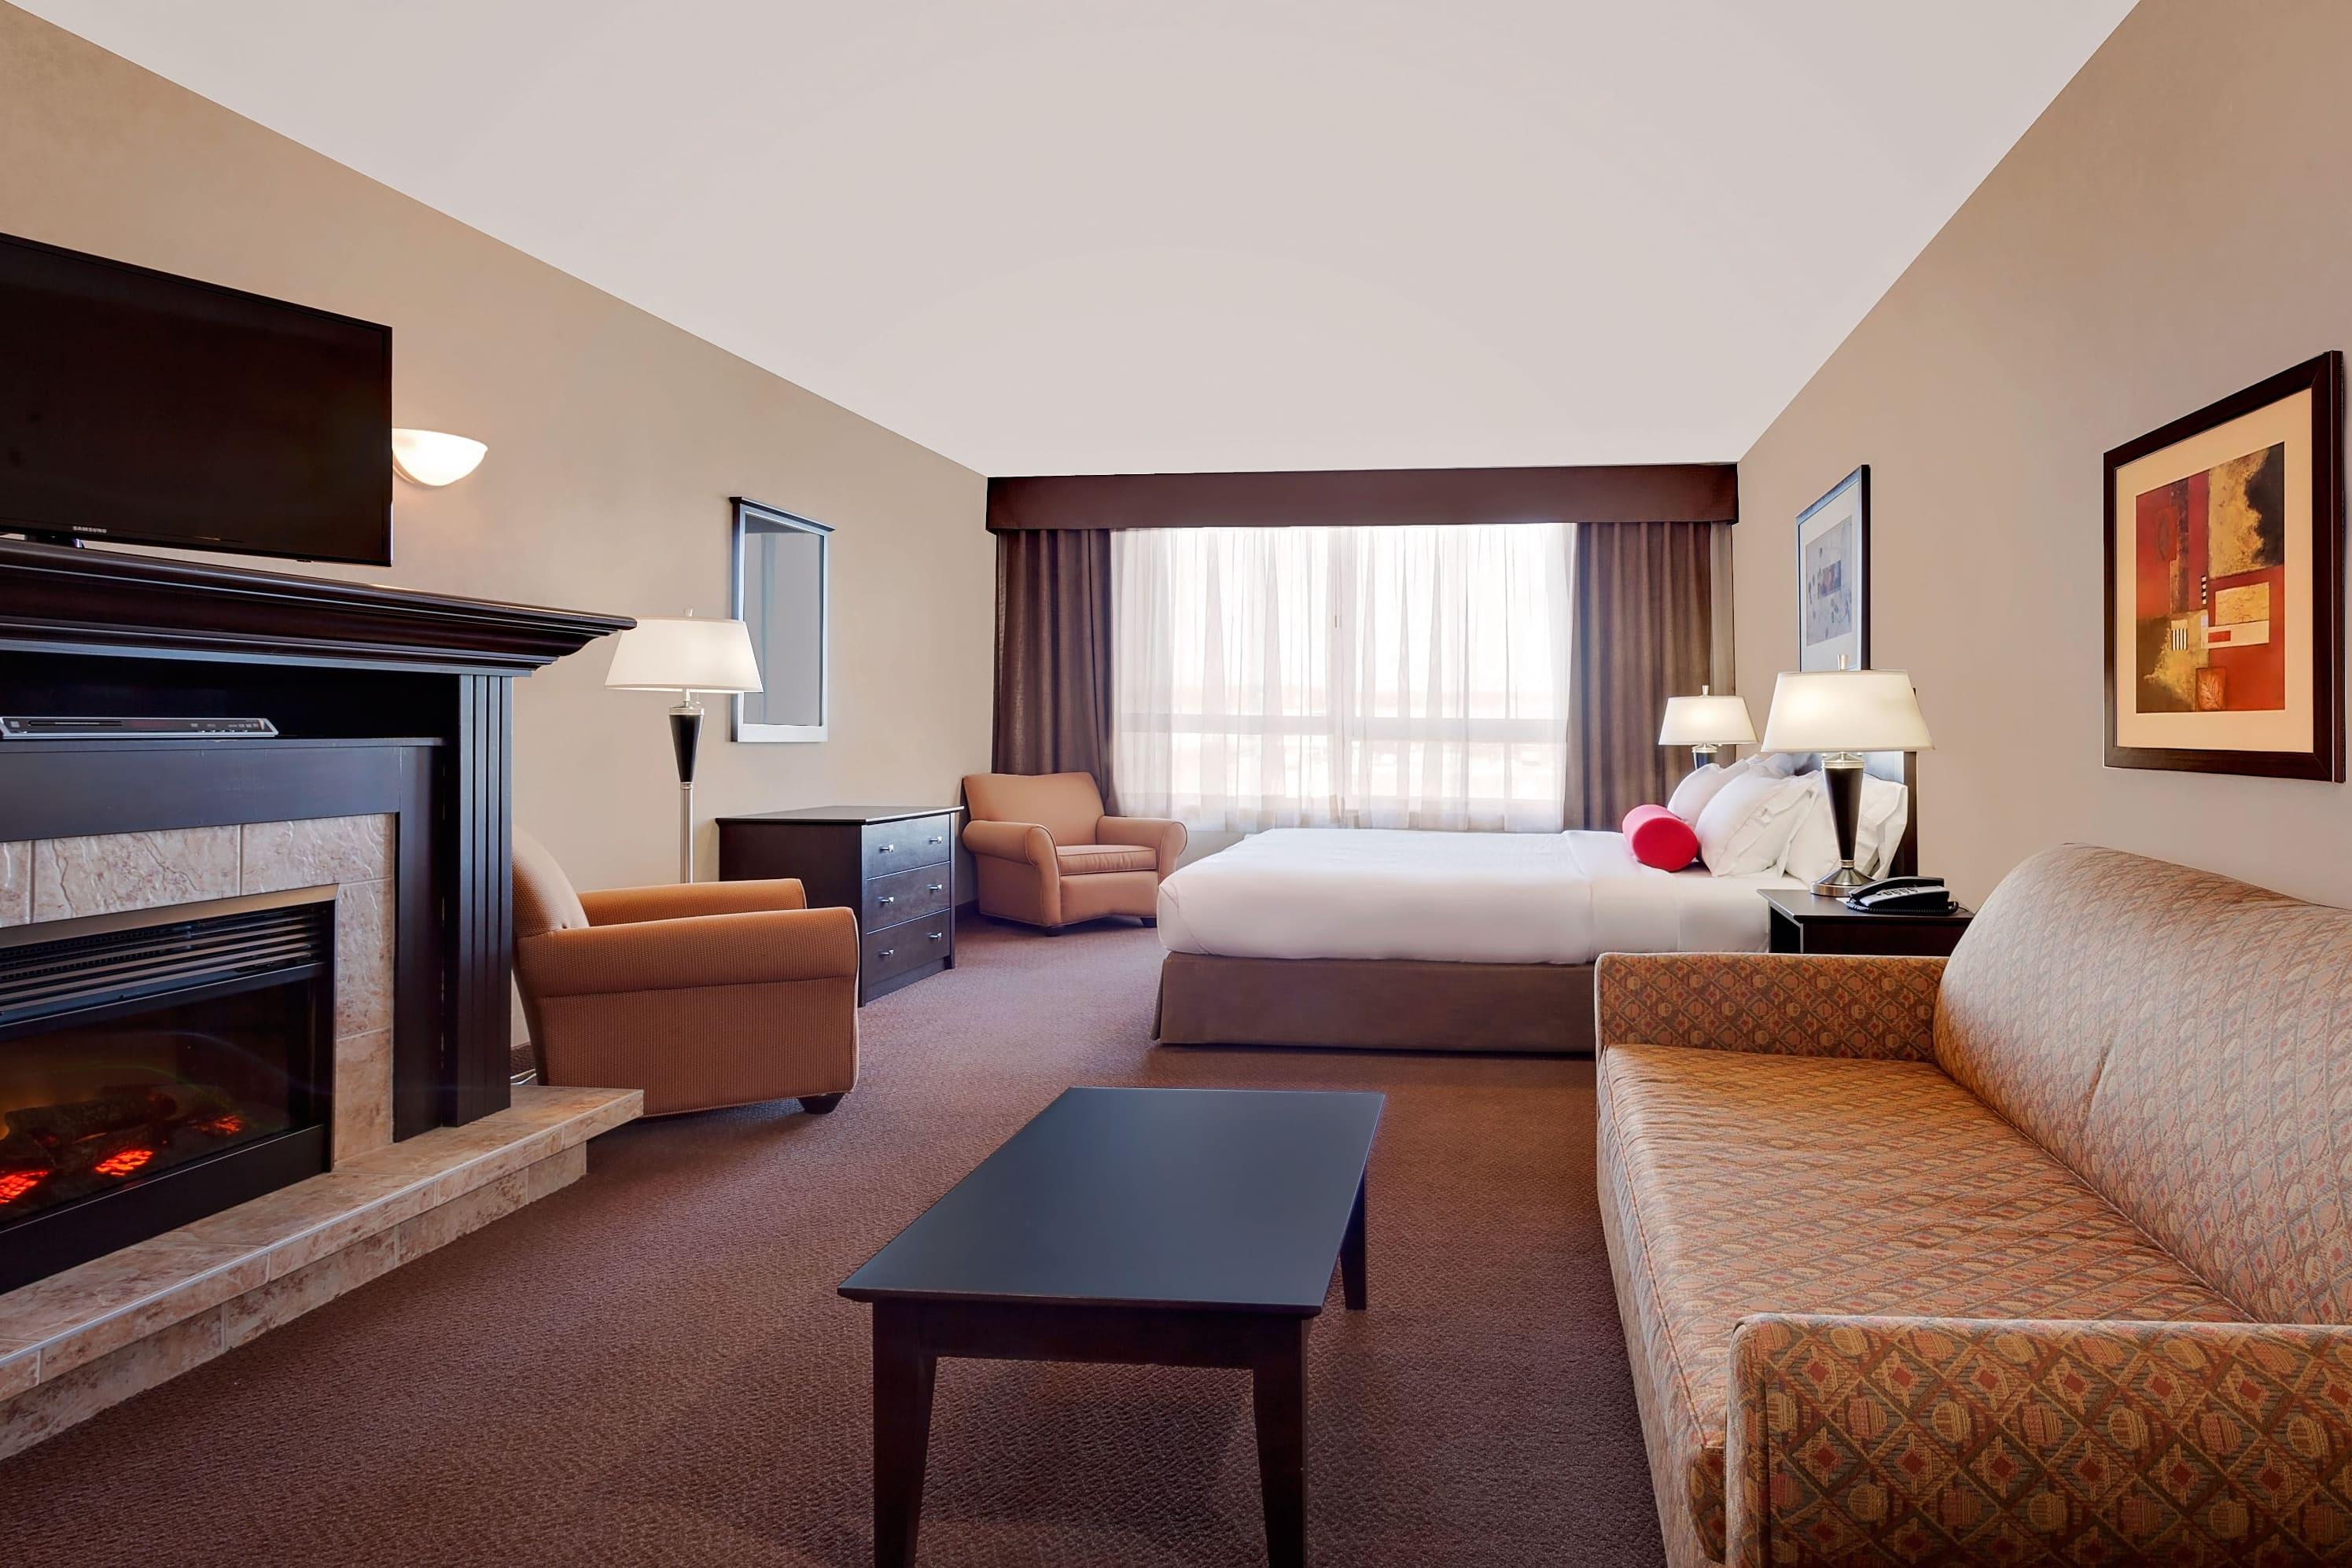 Ramada Stettler suite in Stettler, Alberta